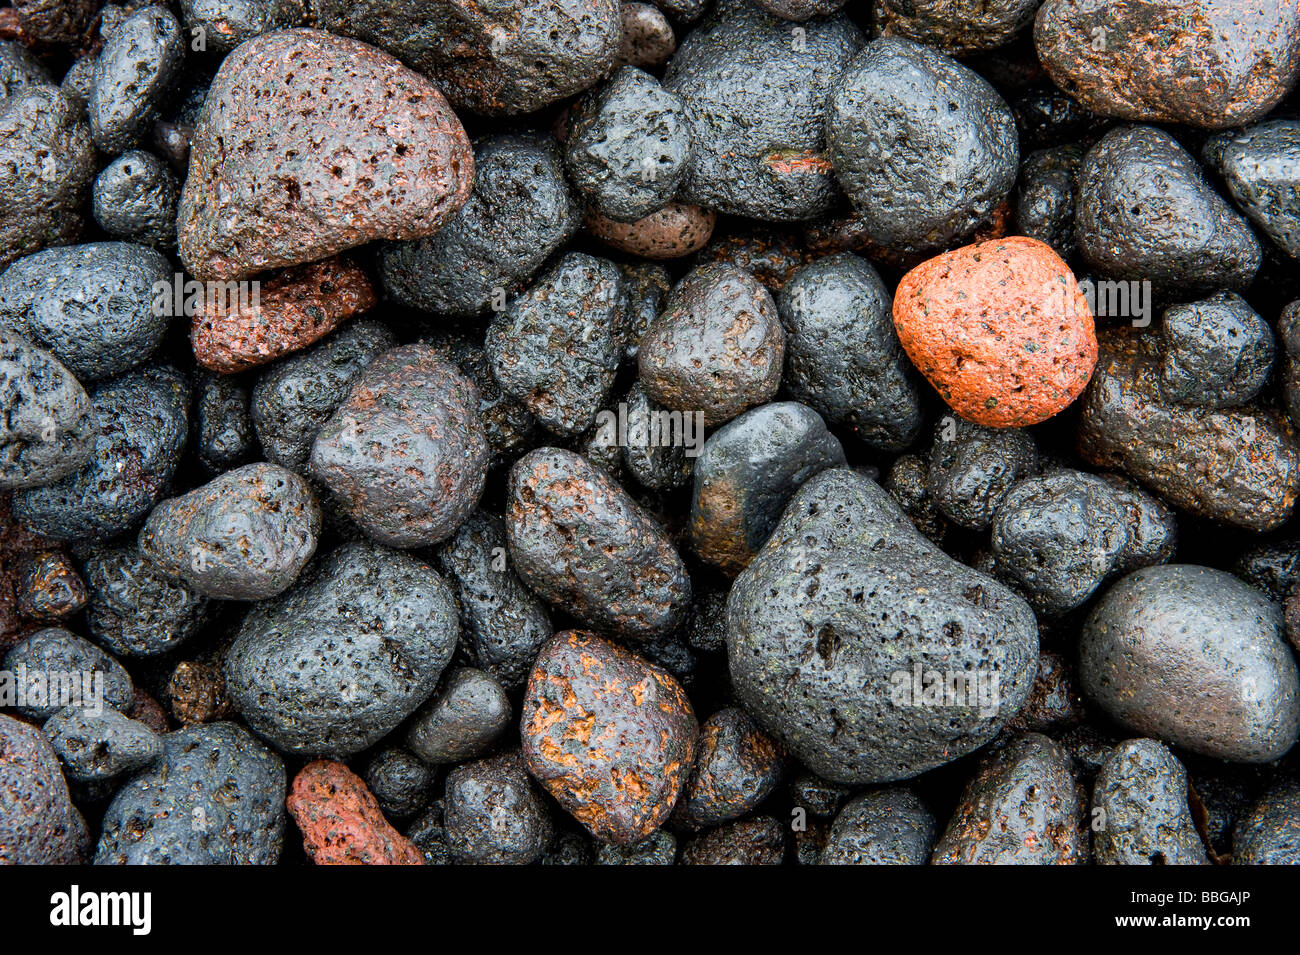 pumice stones, Italy, Stromboli, Liparic Islands - Stock Image